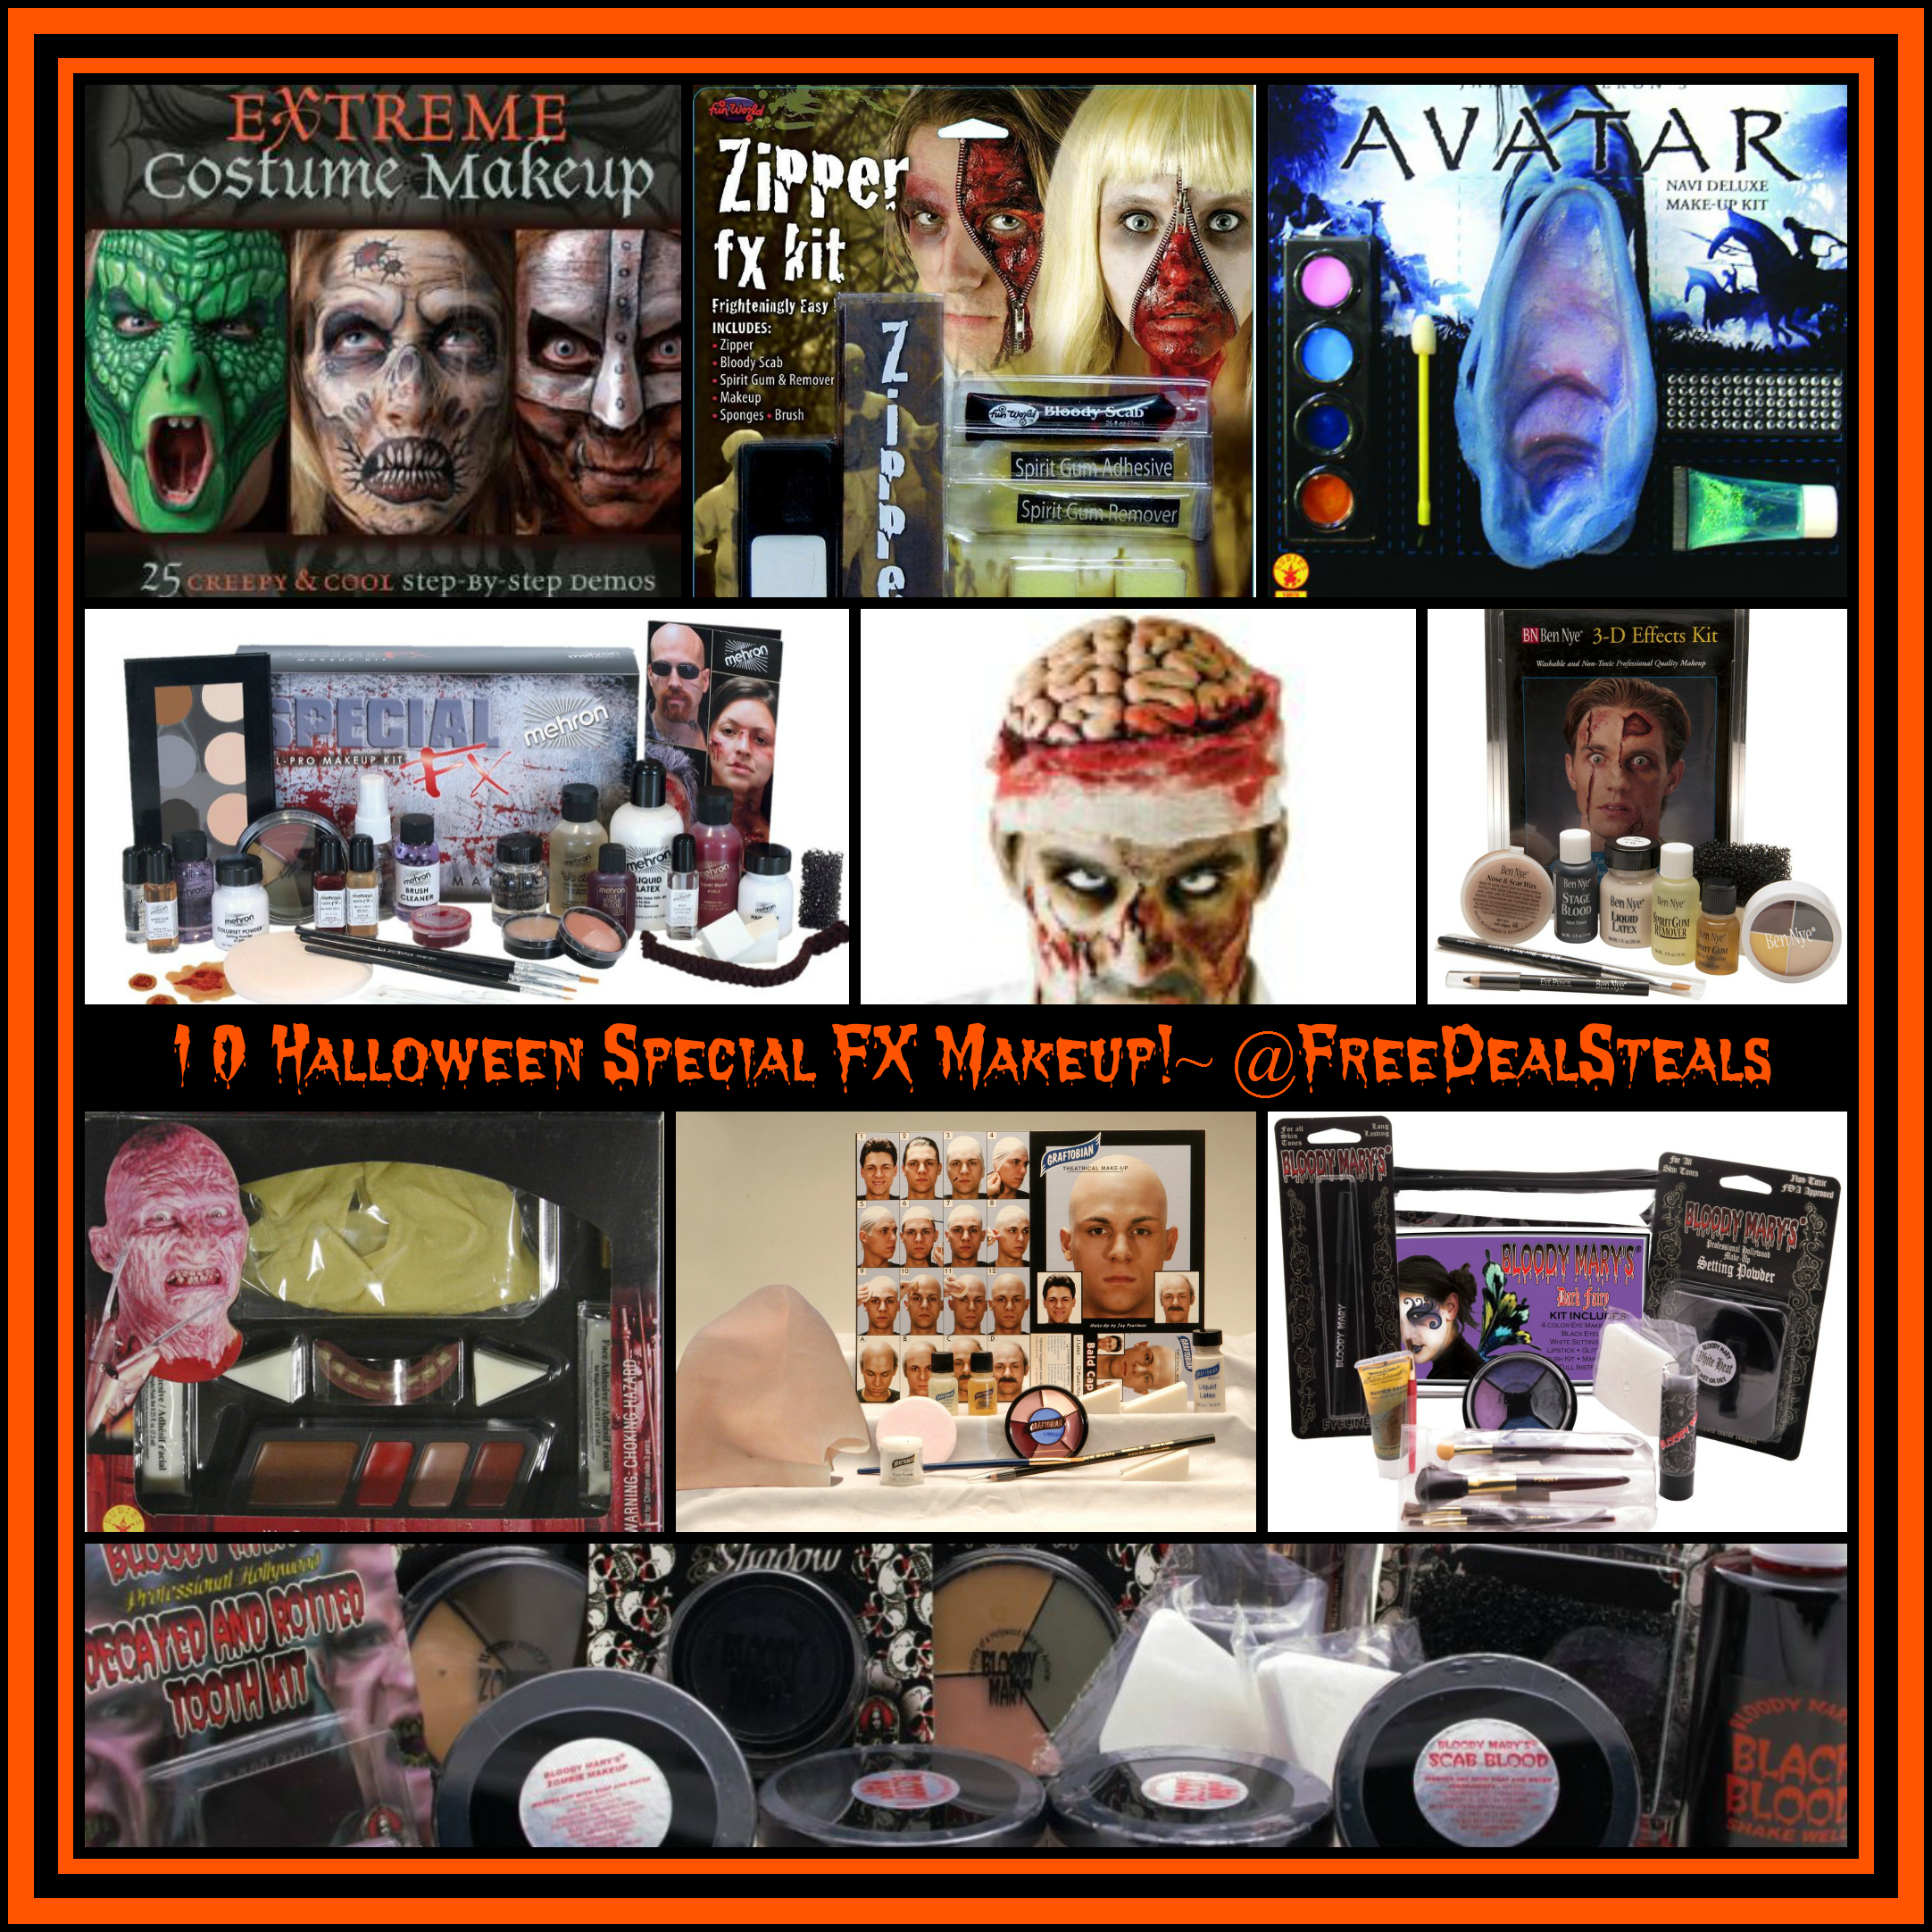 10 Special FX Halloween Makeup Kits Tips Ideas! ~ Freebies Deals ...